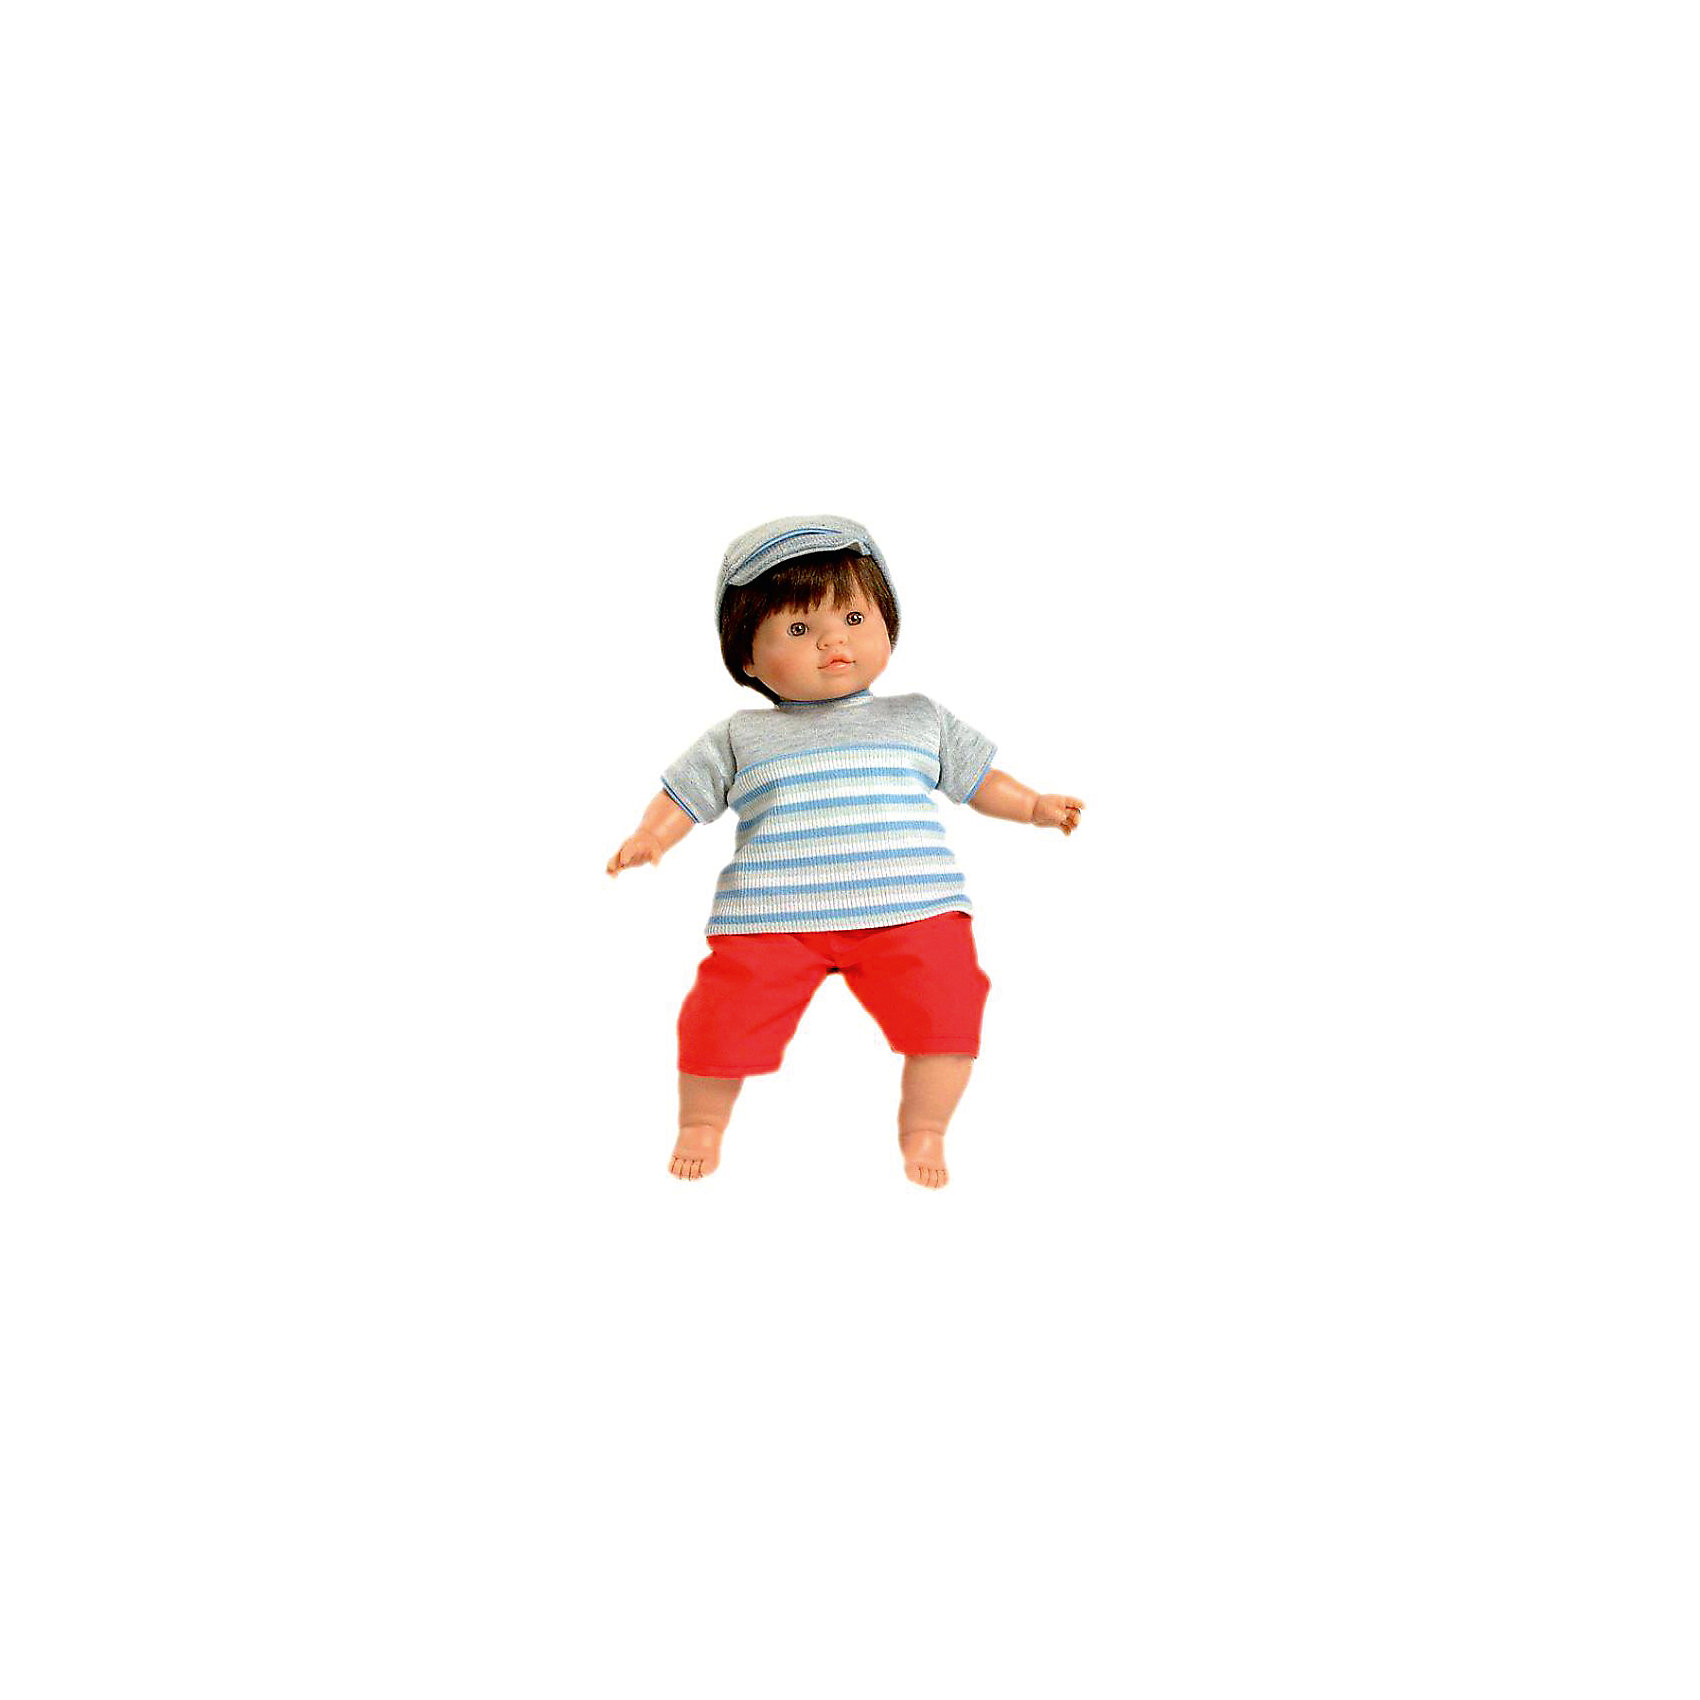 Paola Reina Кукла Нино Барнард, 36 см куклы и одежда для кукол paola reina кукла вирджи 36 см